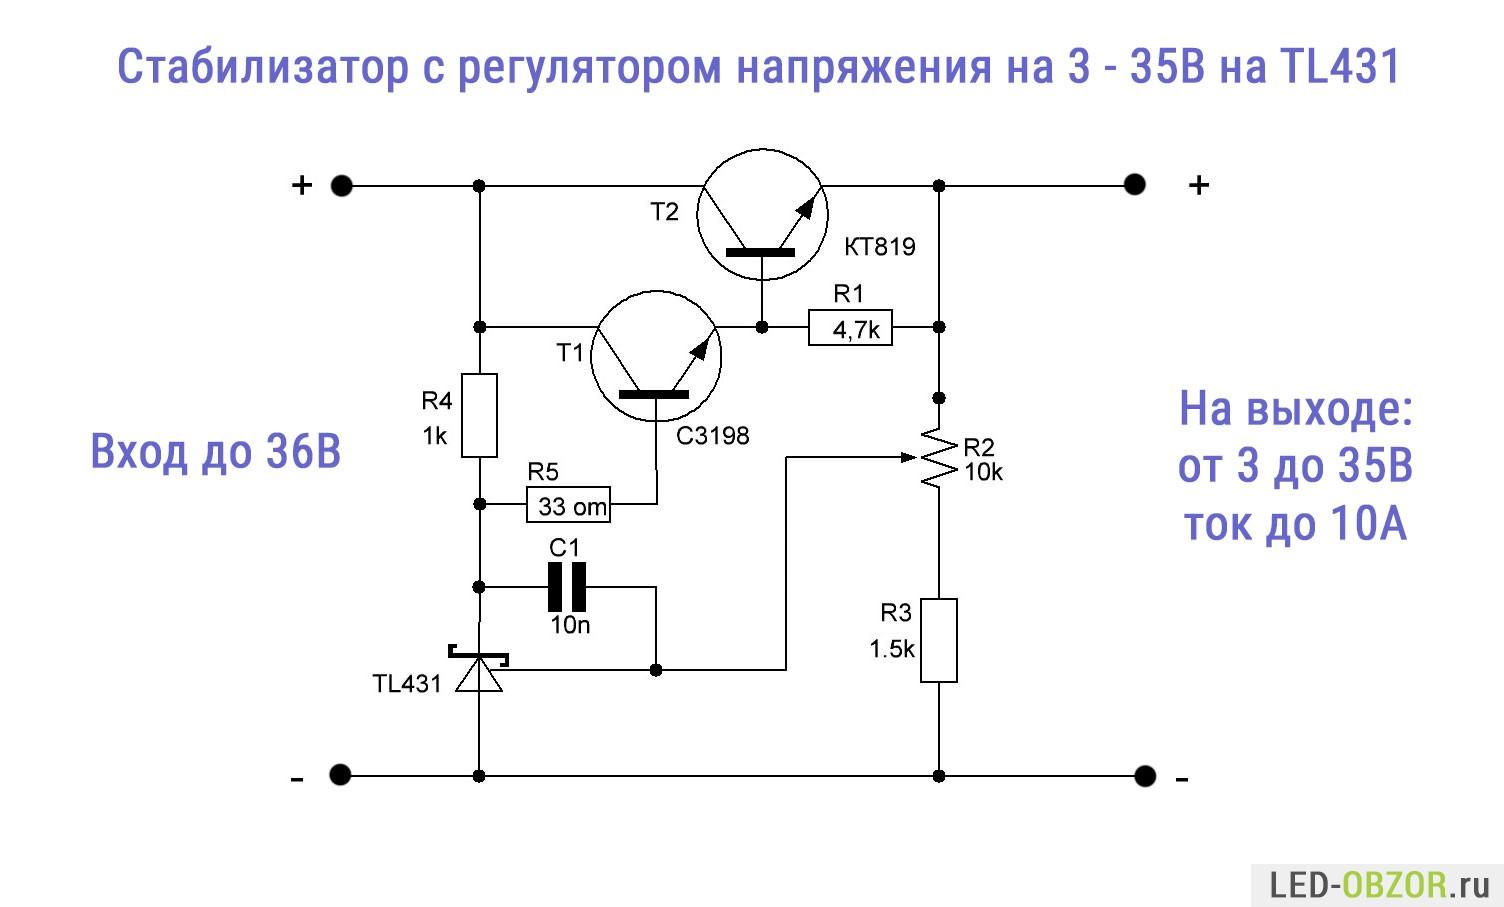 Tl431 схема включения с оптопарой